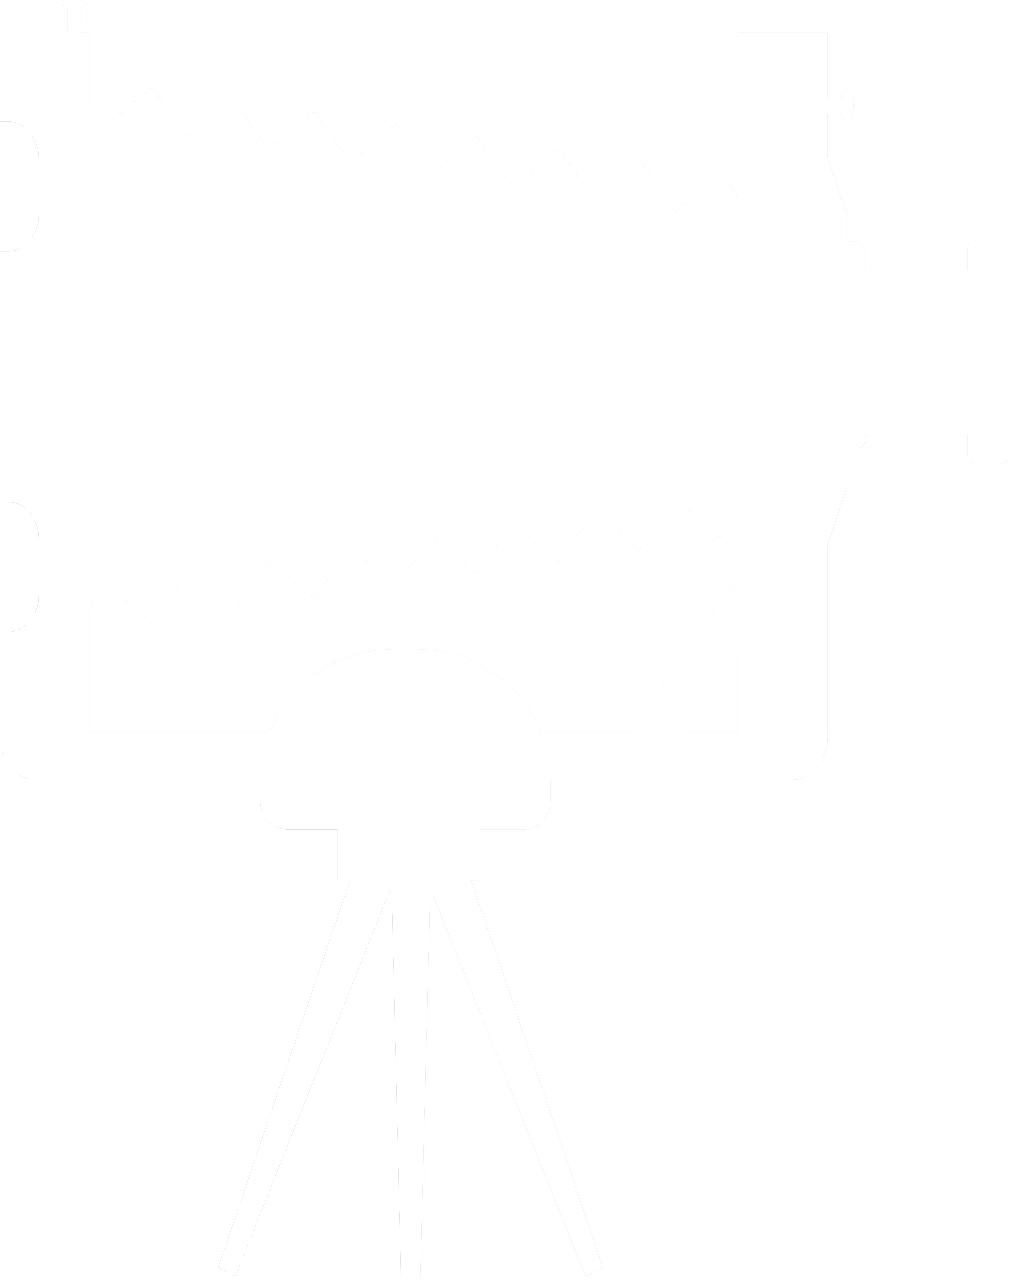 camera-1710302_1280 Kopie weiß1290px